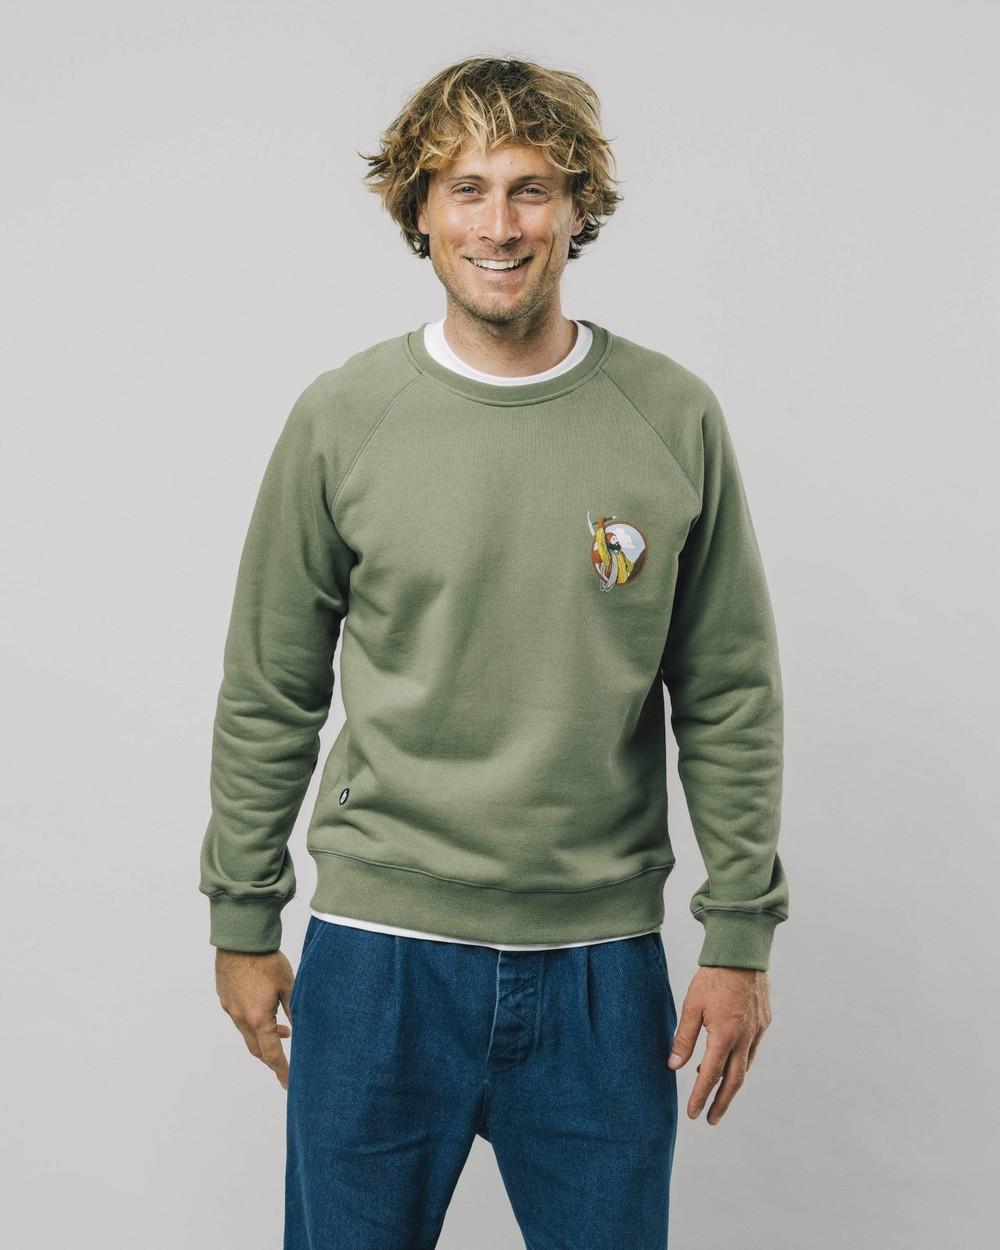 The hiker sweatshirt - Brava Fabrics